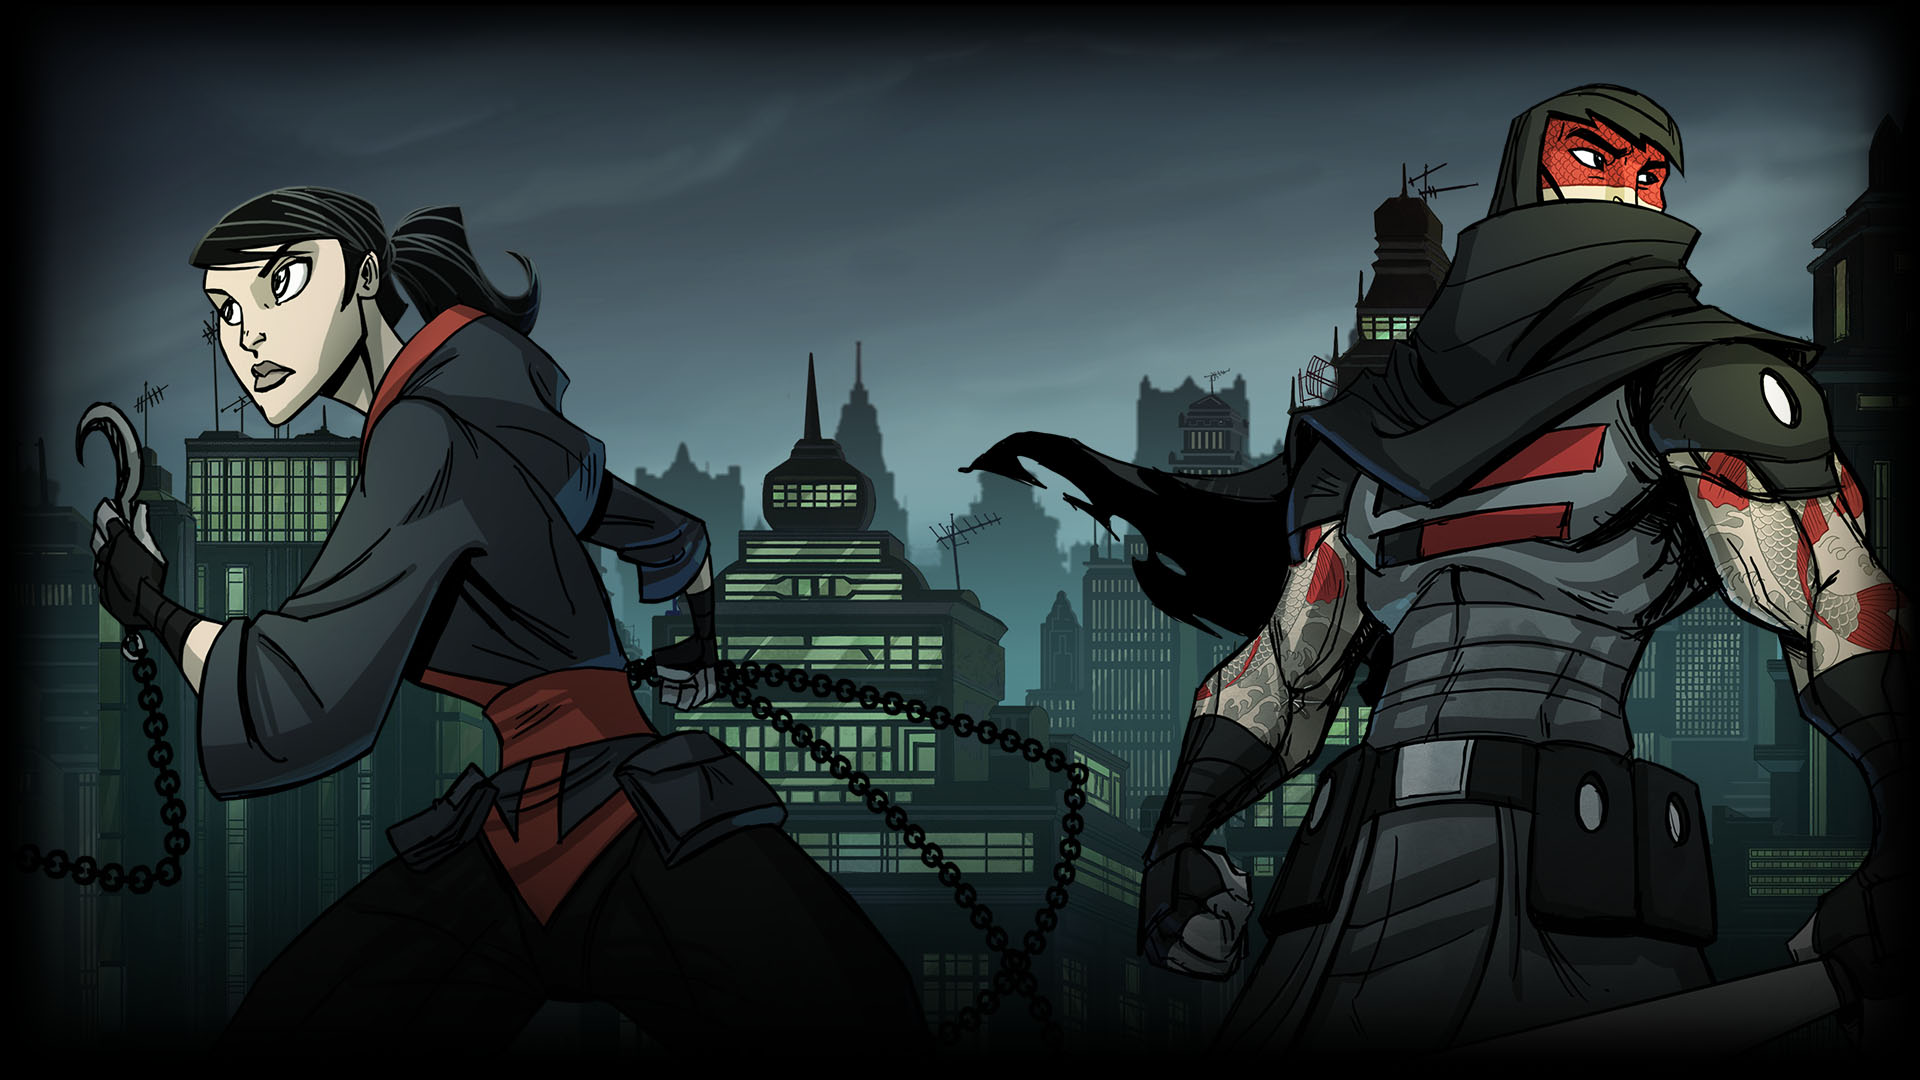 Steam Community Market Listings For 860950 Ninja And Ora